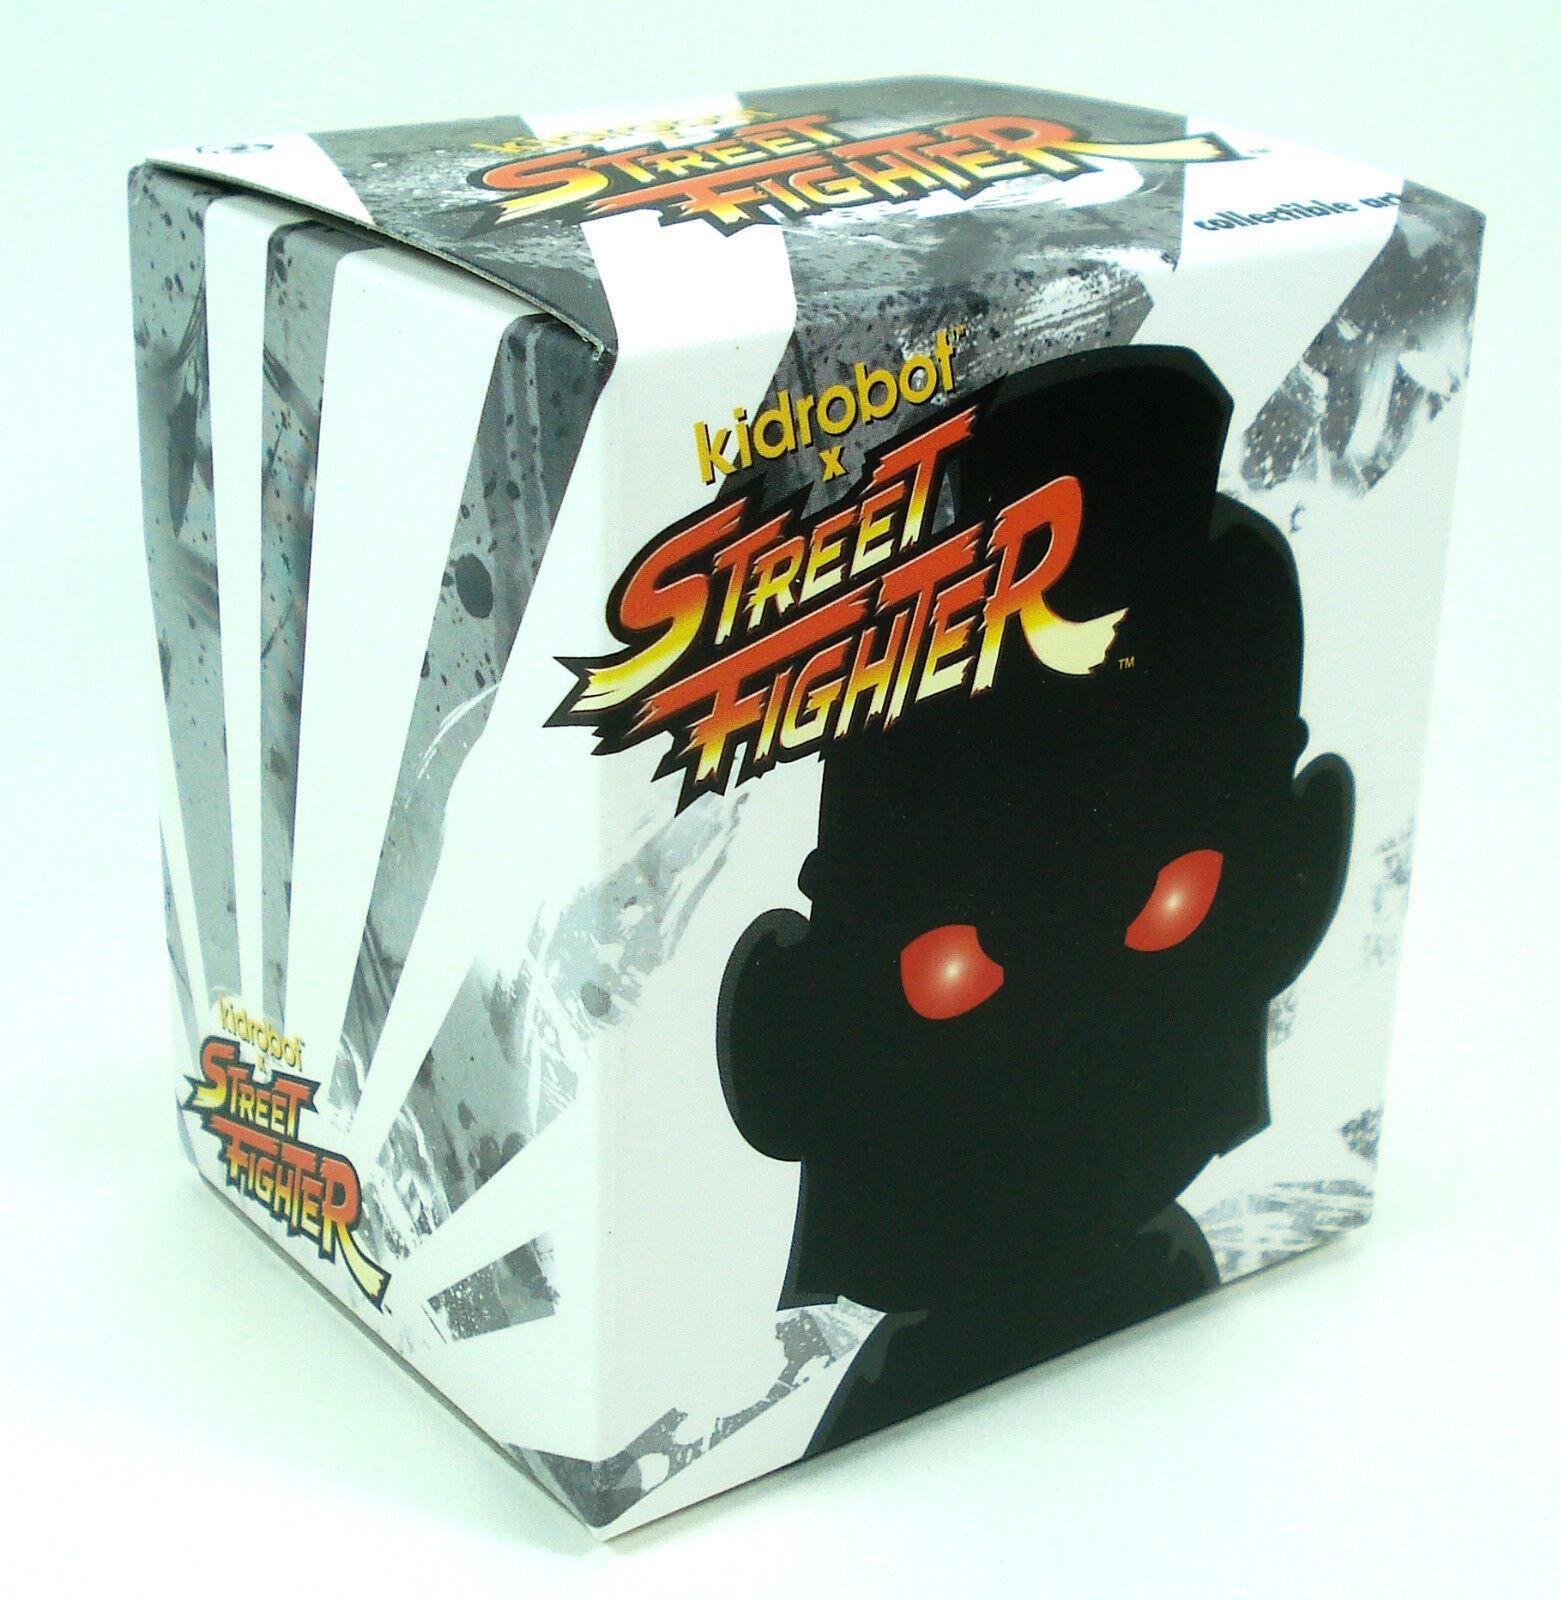 SDCC Comic Con 2013 EXCLUSIVE Street Fighter MECHA ZANGIEF Kidrobot Kidrobot Kidrobot 3  Sealed 486c27